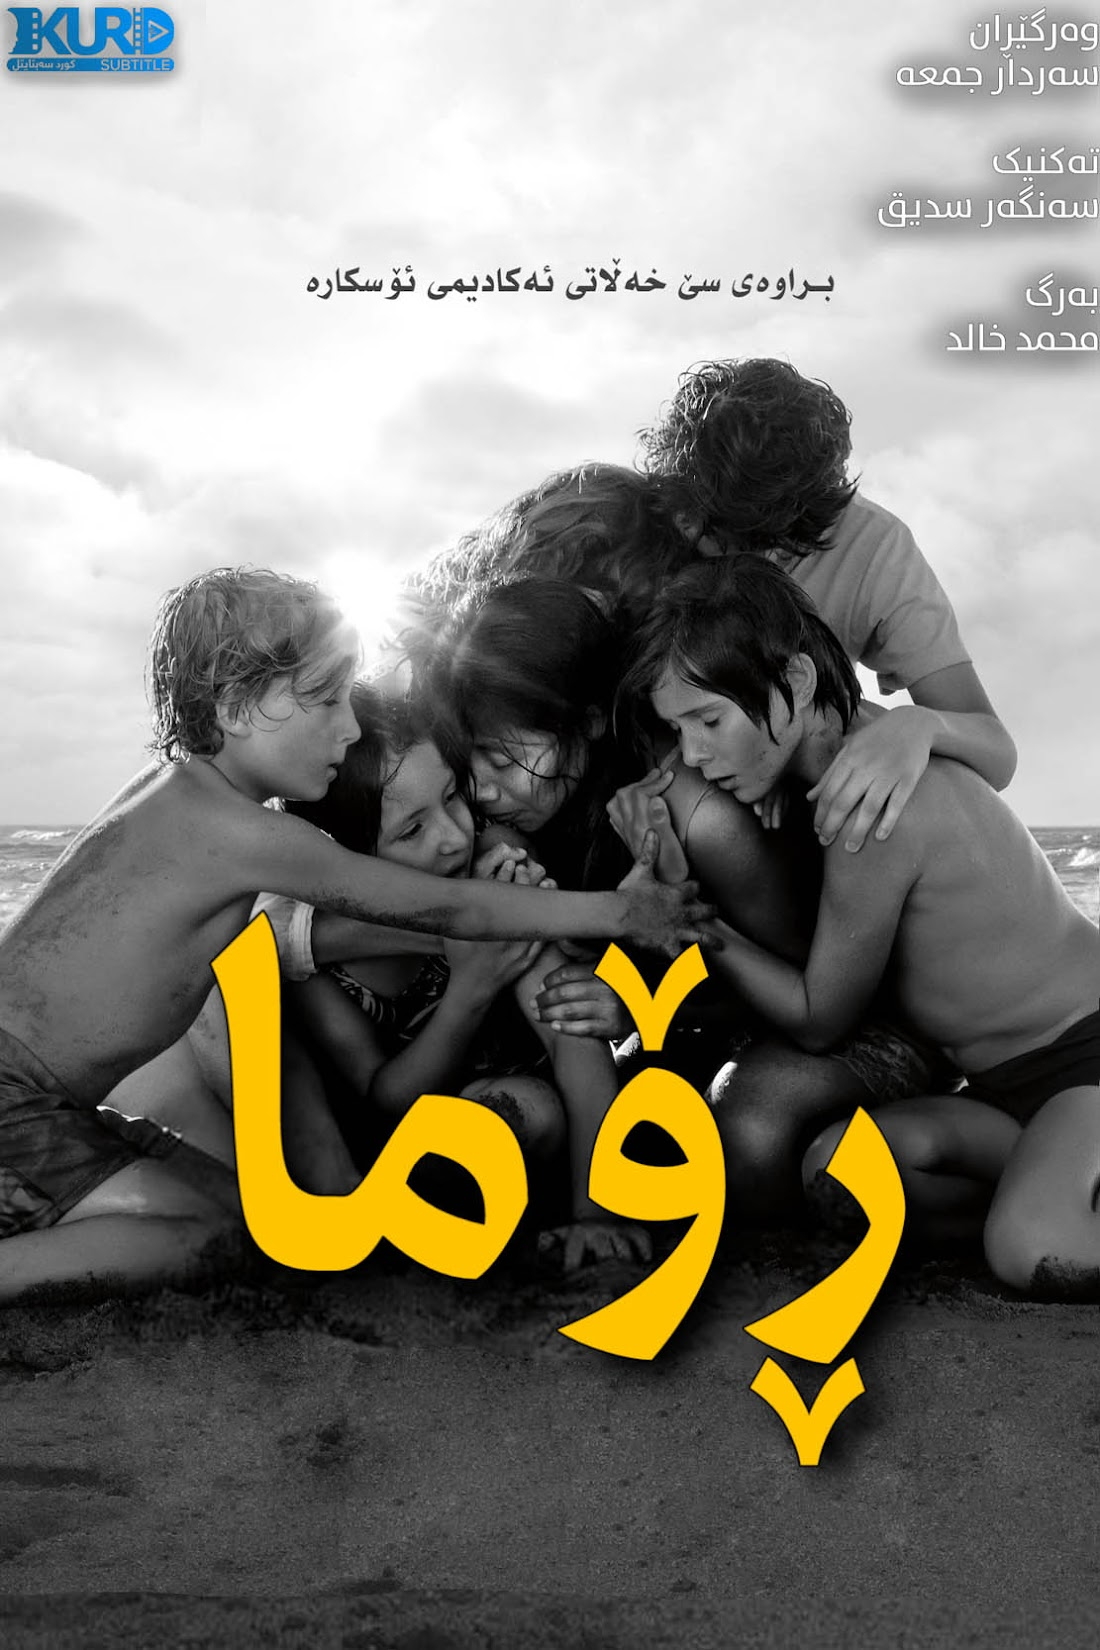 Roma kurdish poster